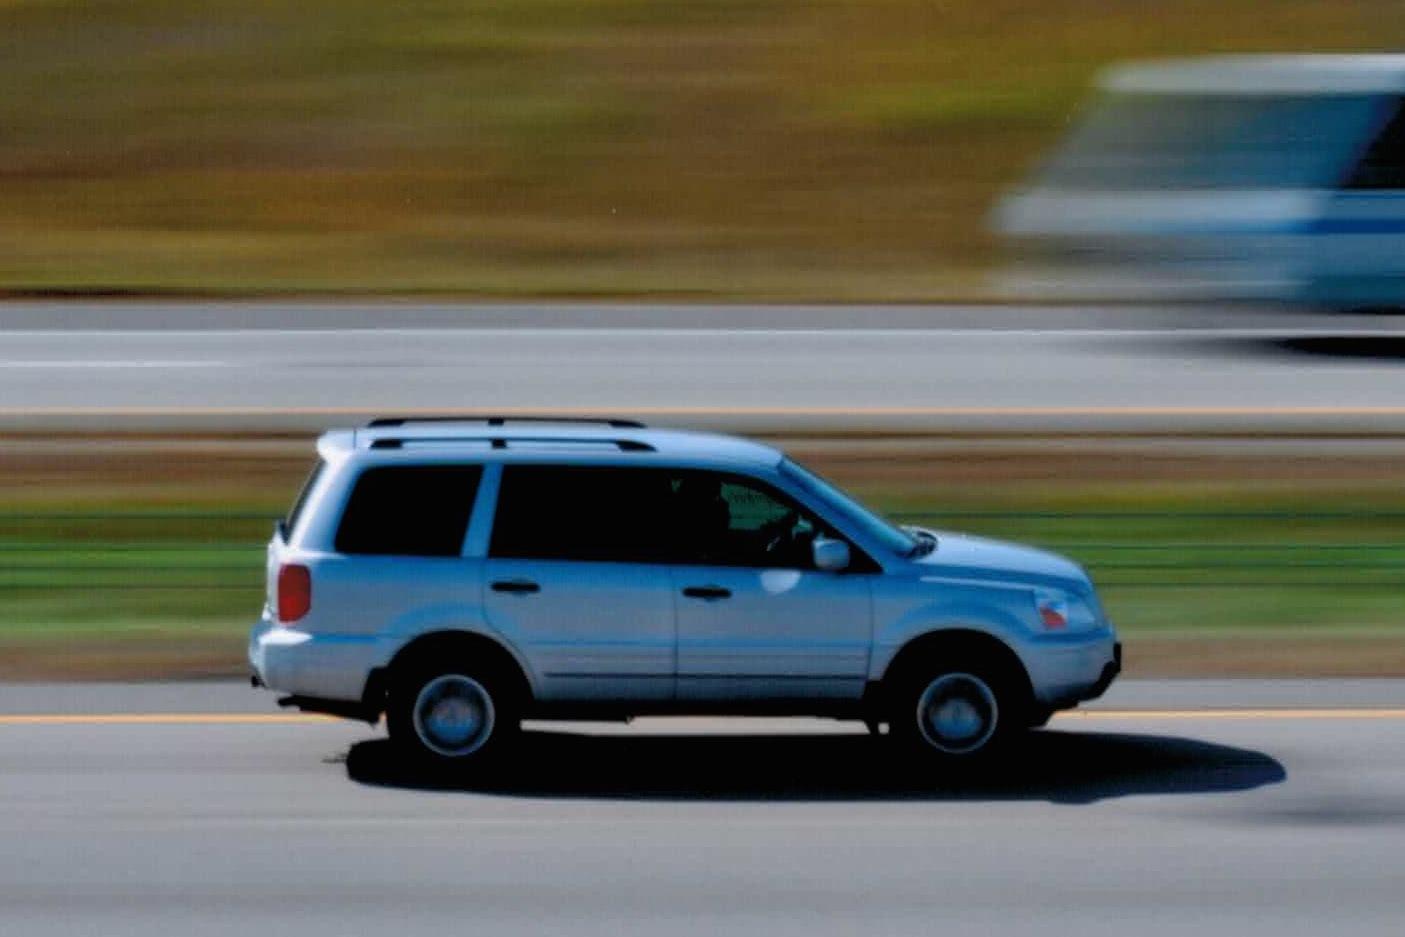 Car_-_Mike_2012